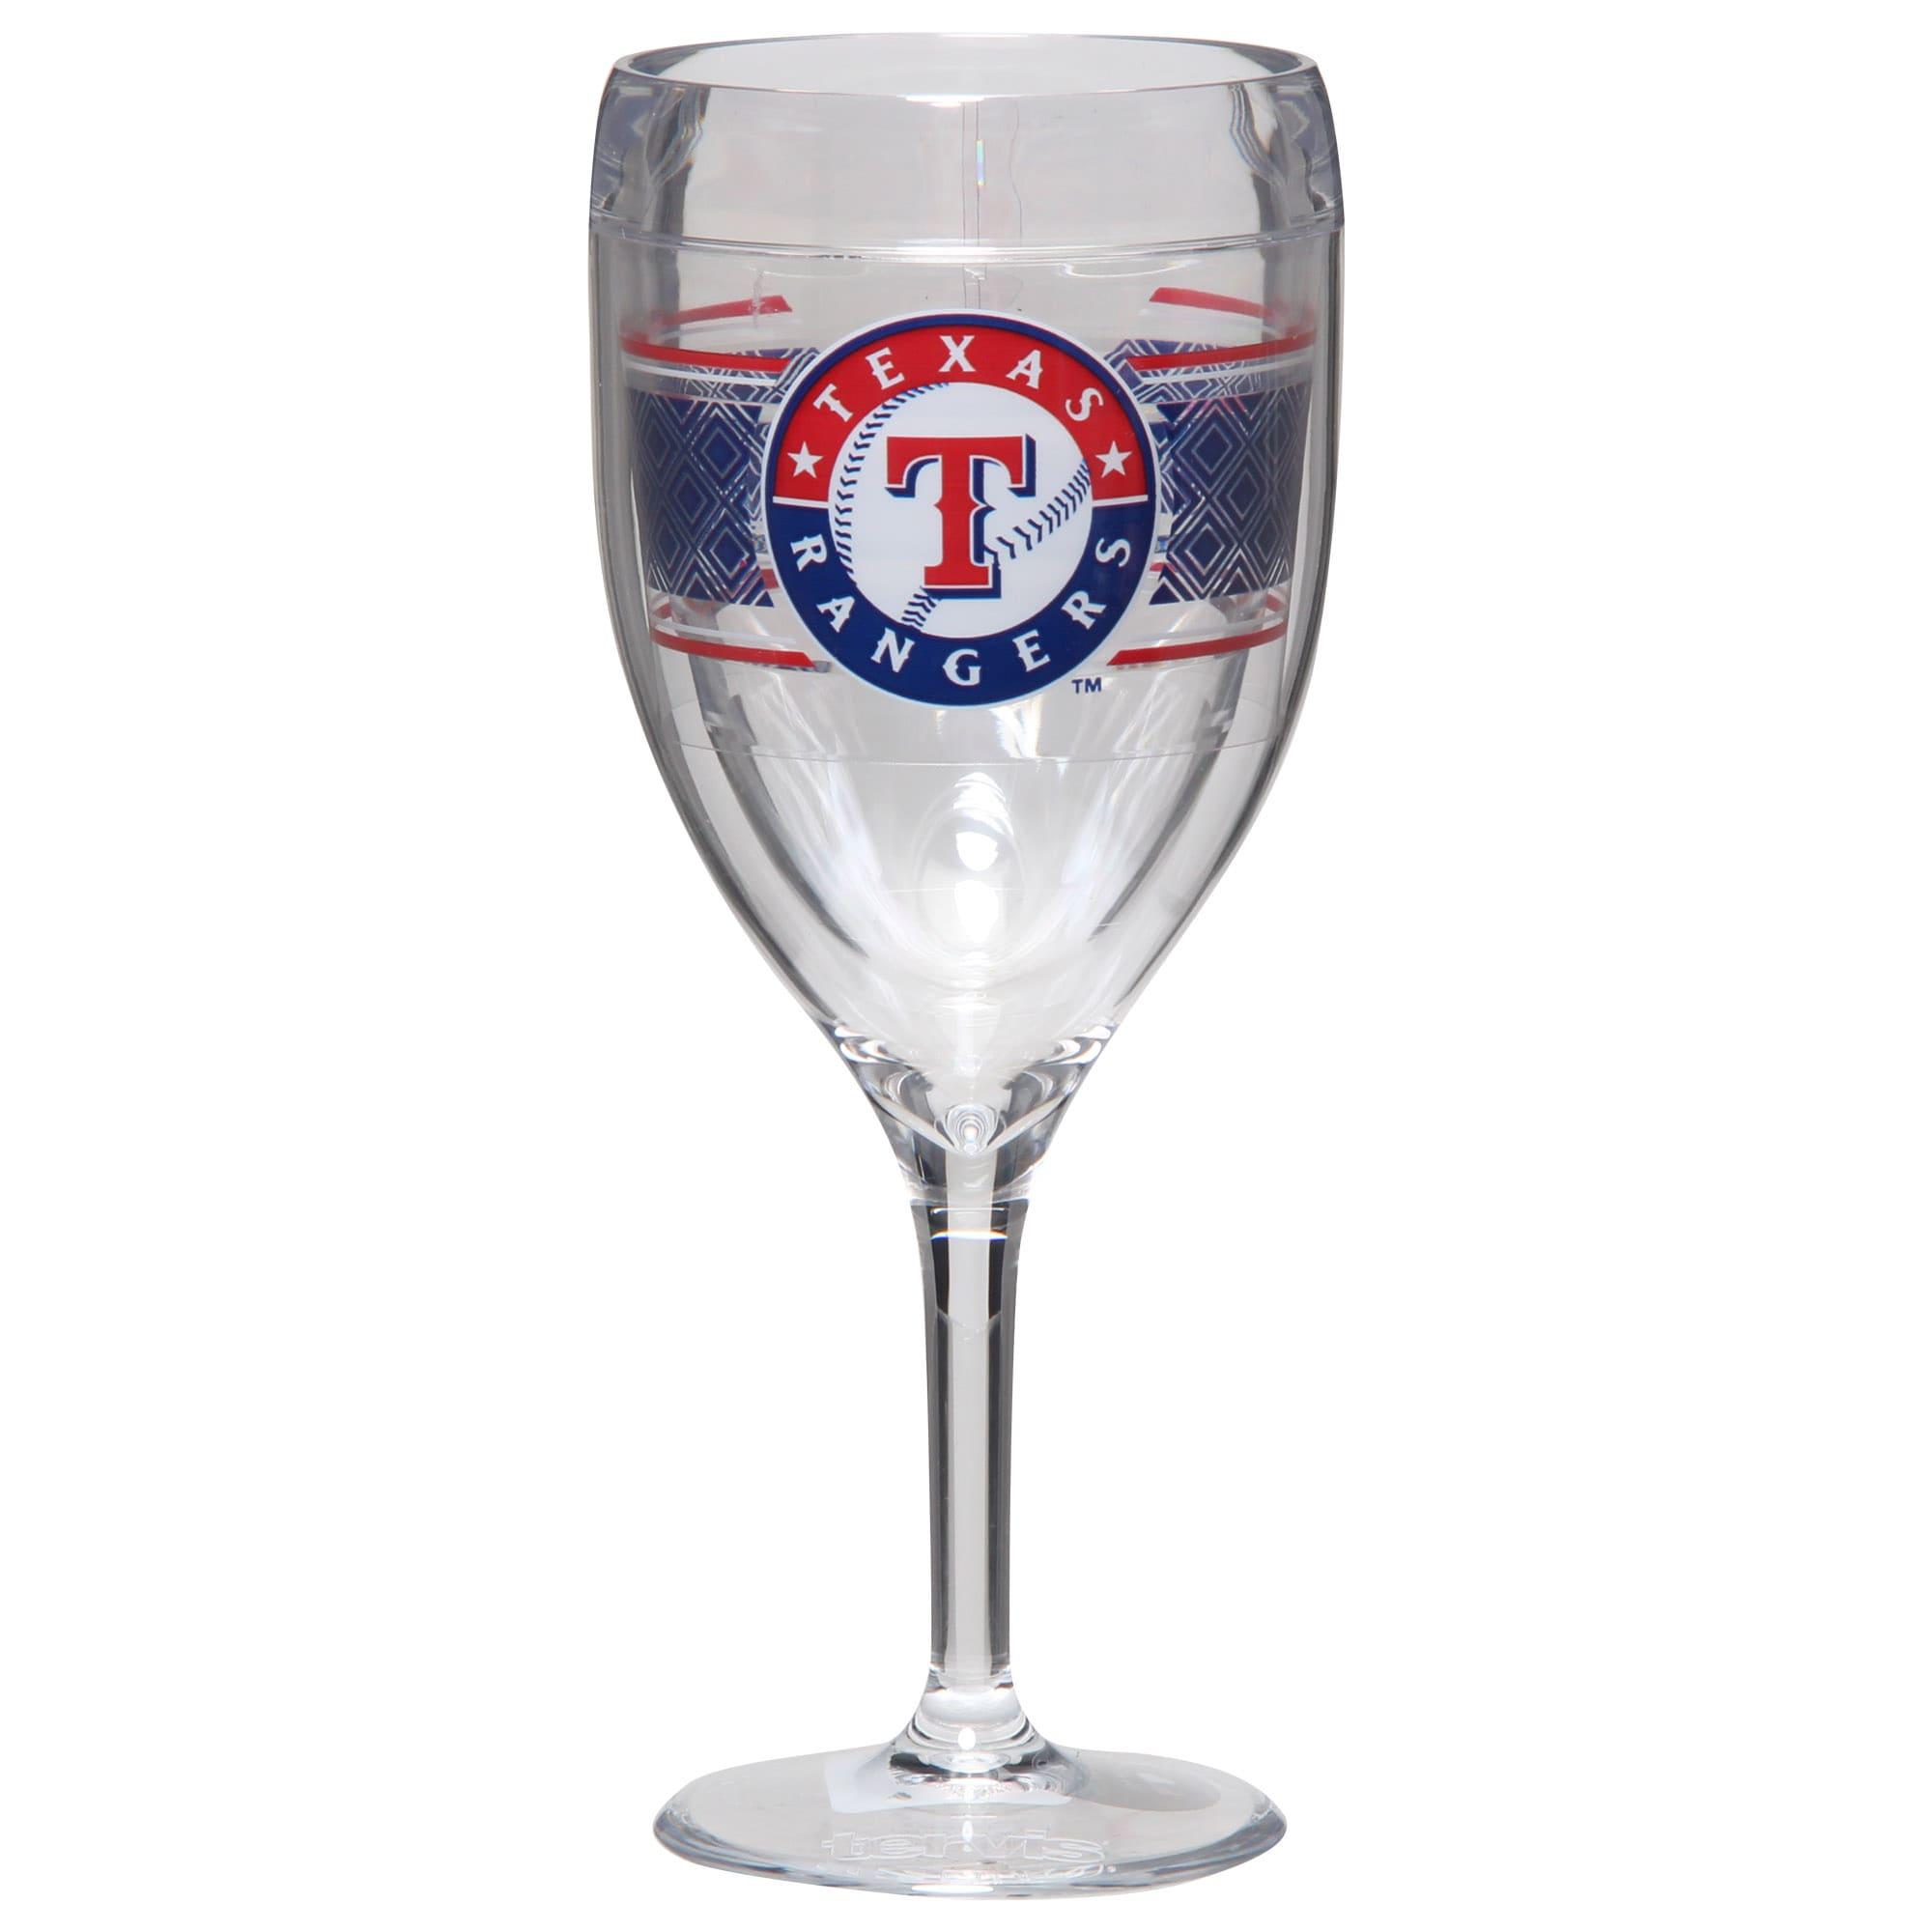 Texas Rangers Tervis 9oz. Stemmed Wine Glass